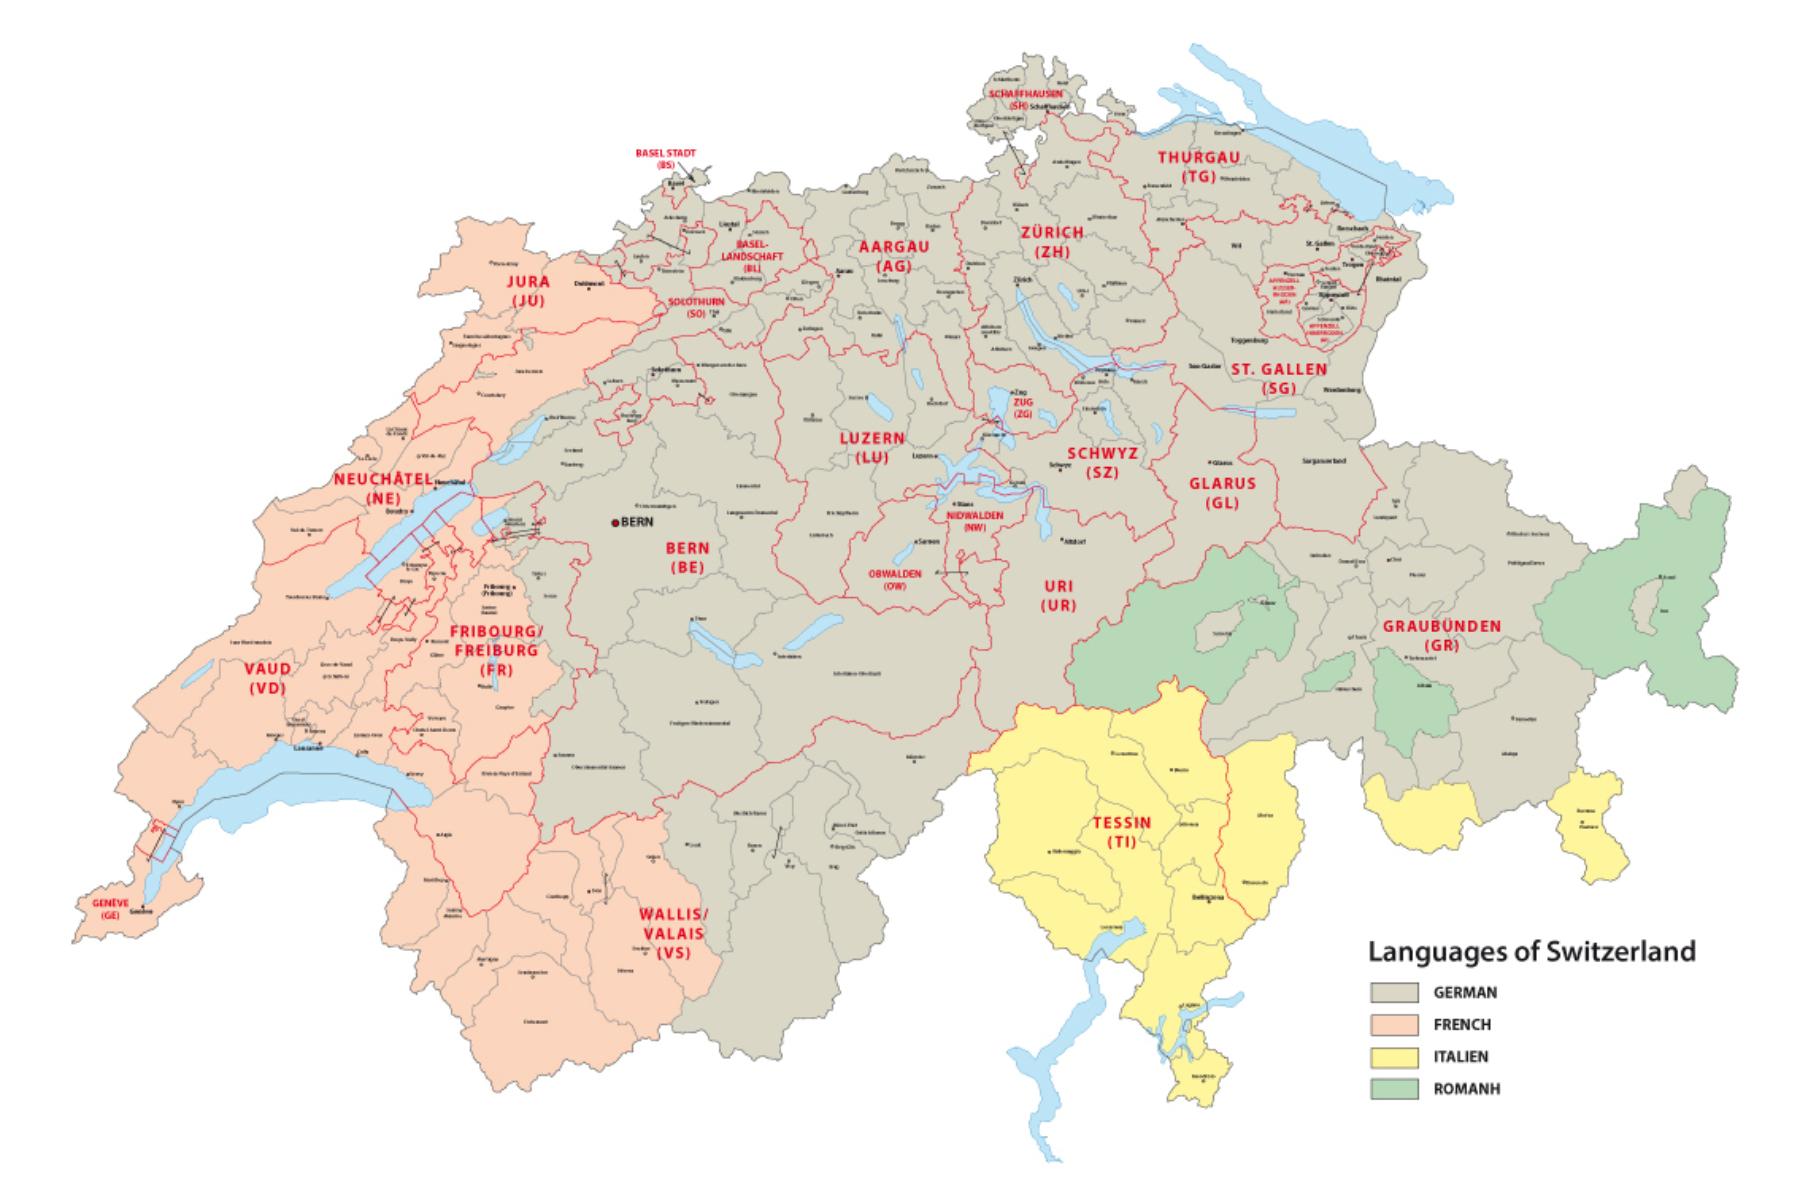 language distribution in switzerland